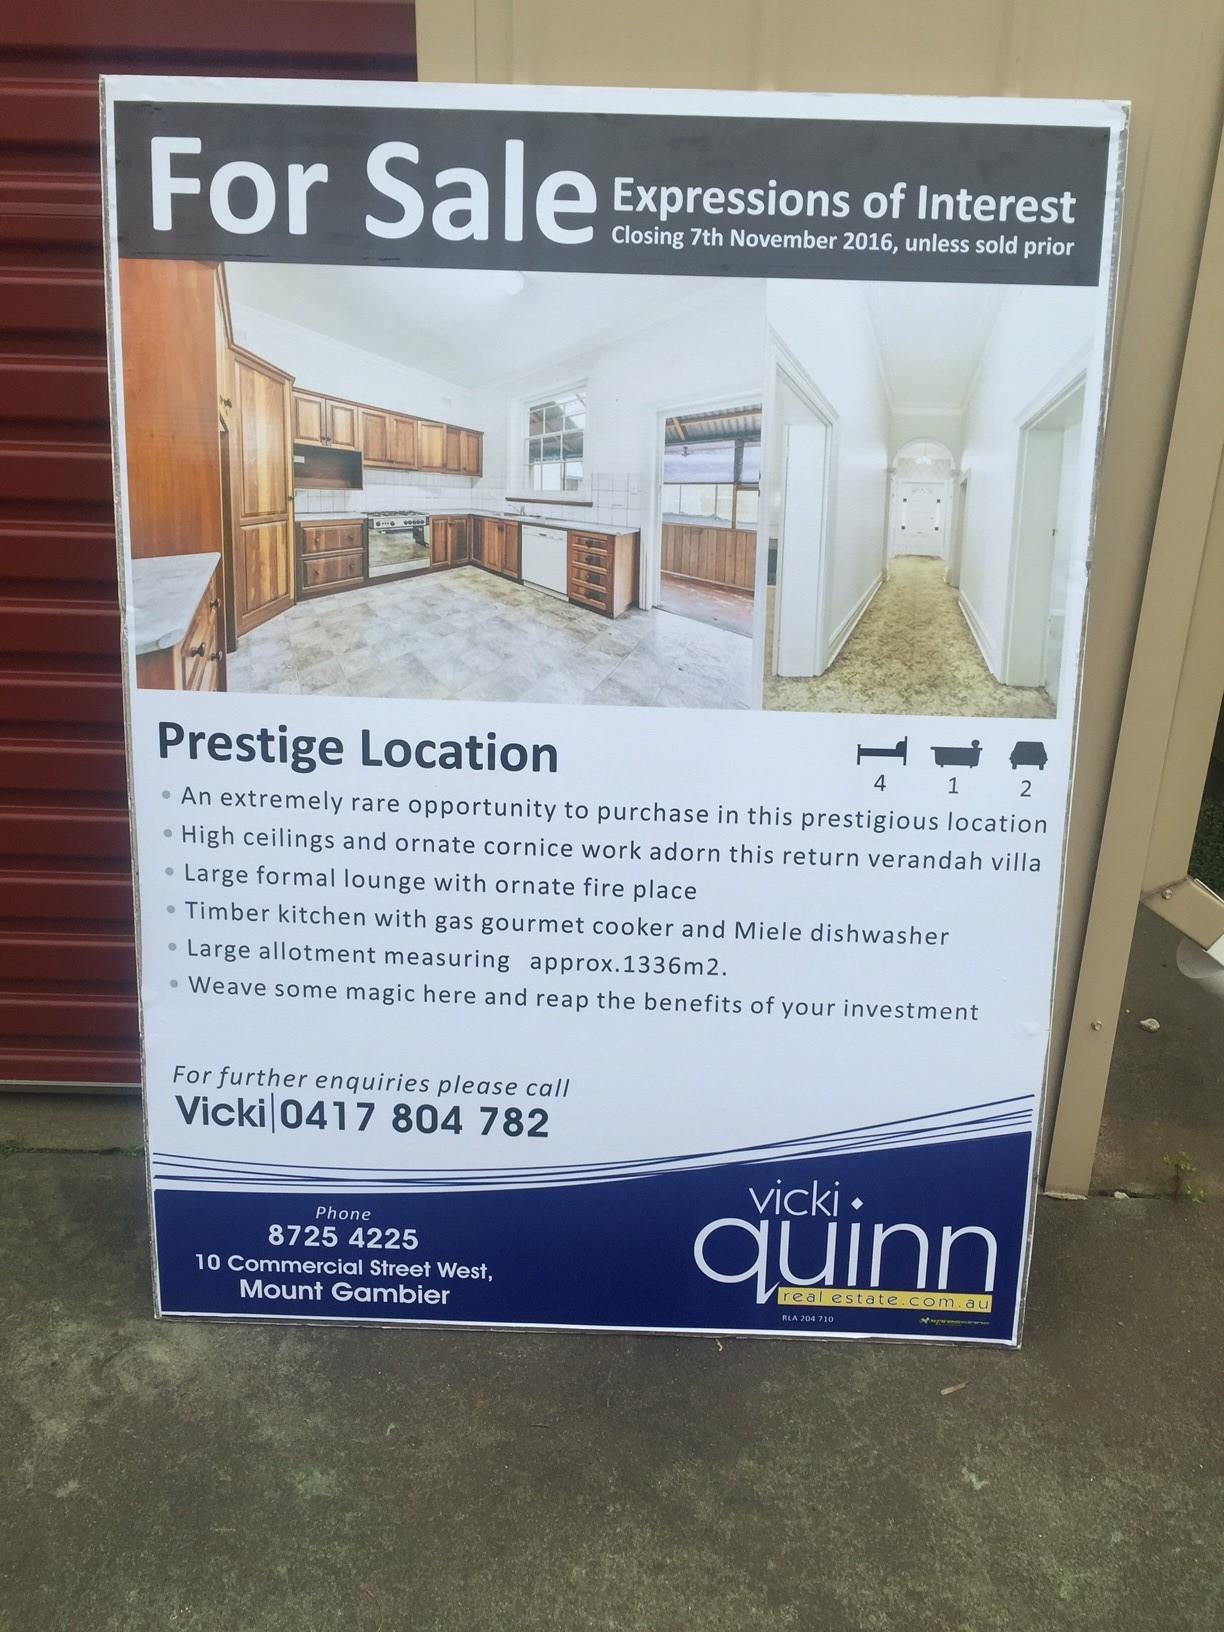 Vicki Quinn Real Estate Corflute